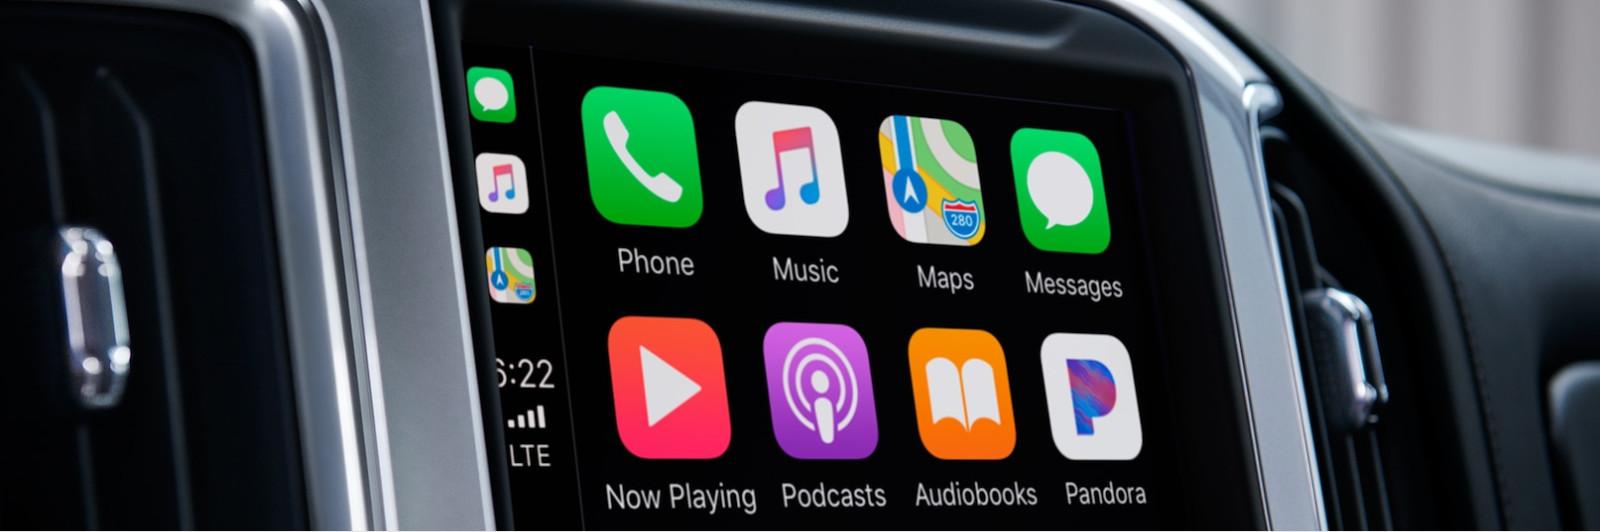 Apple CarPlay in the 2019 Silverado 1500